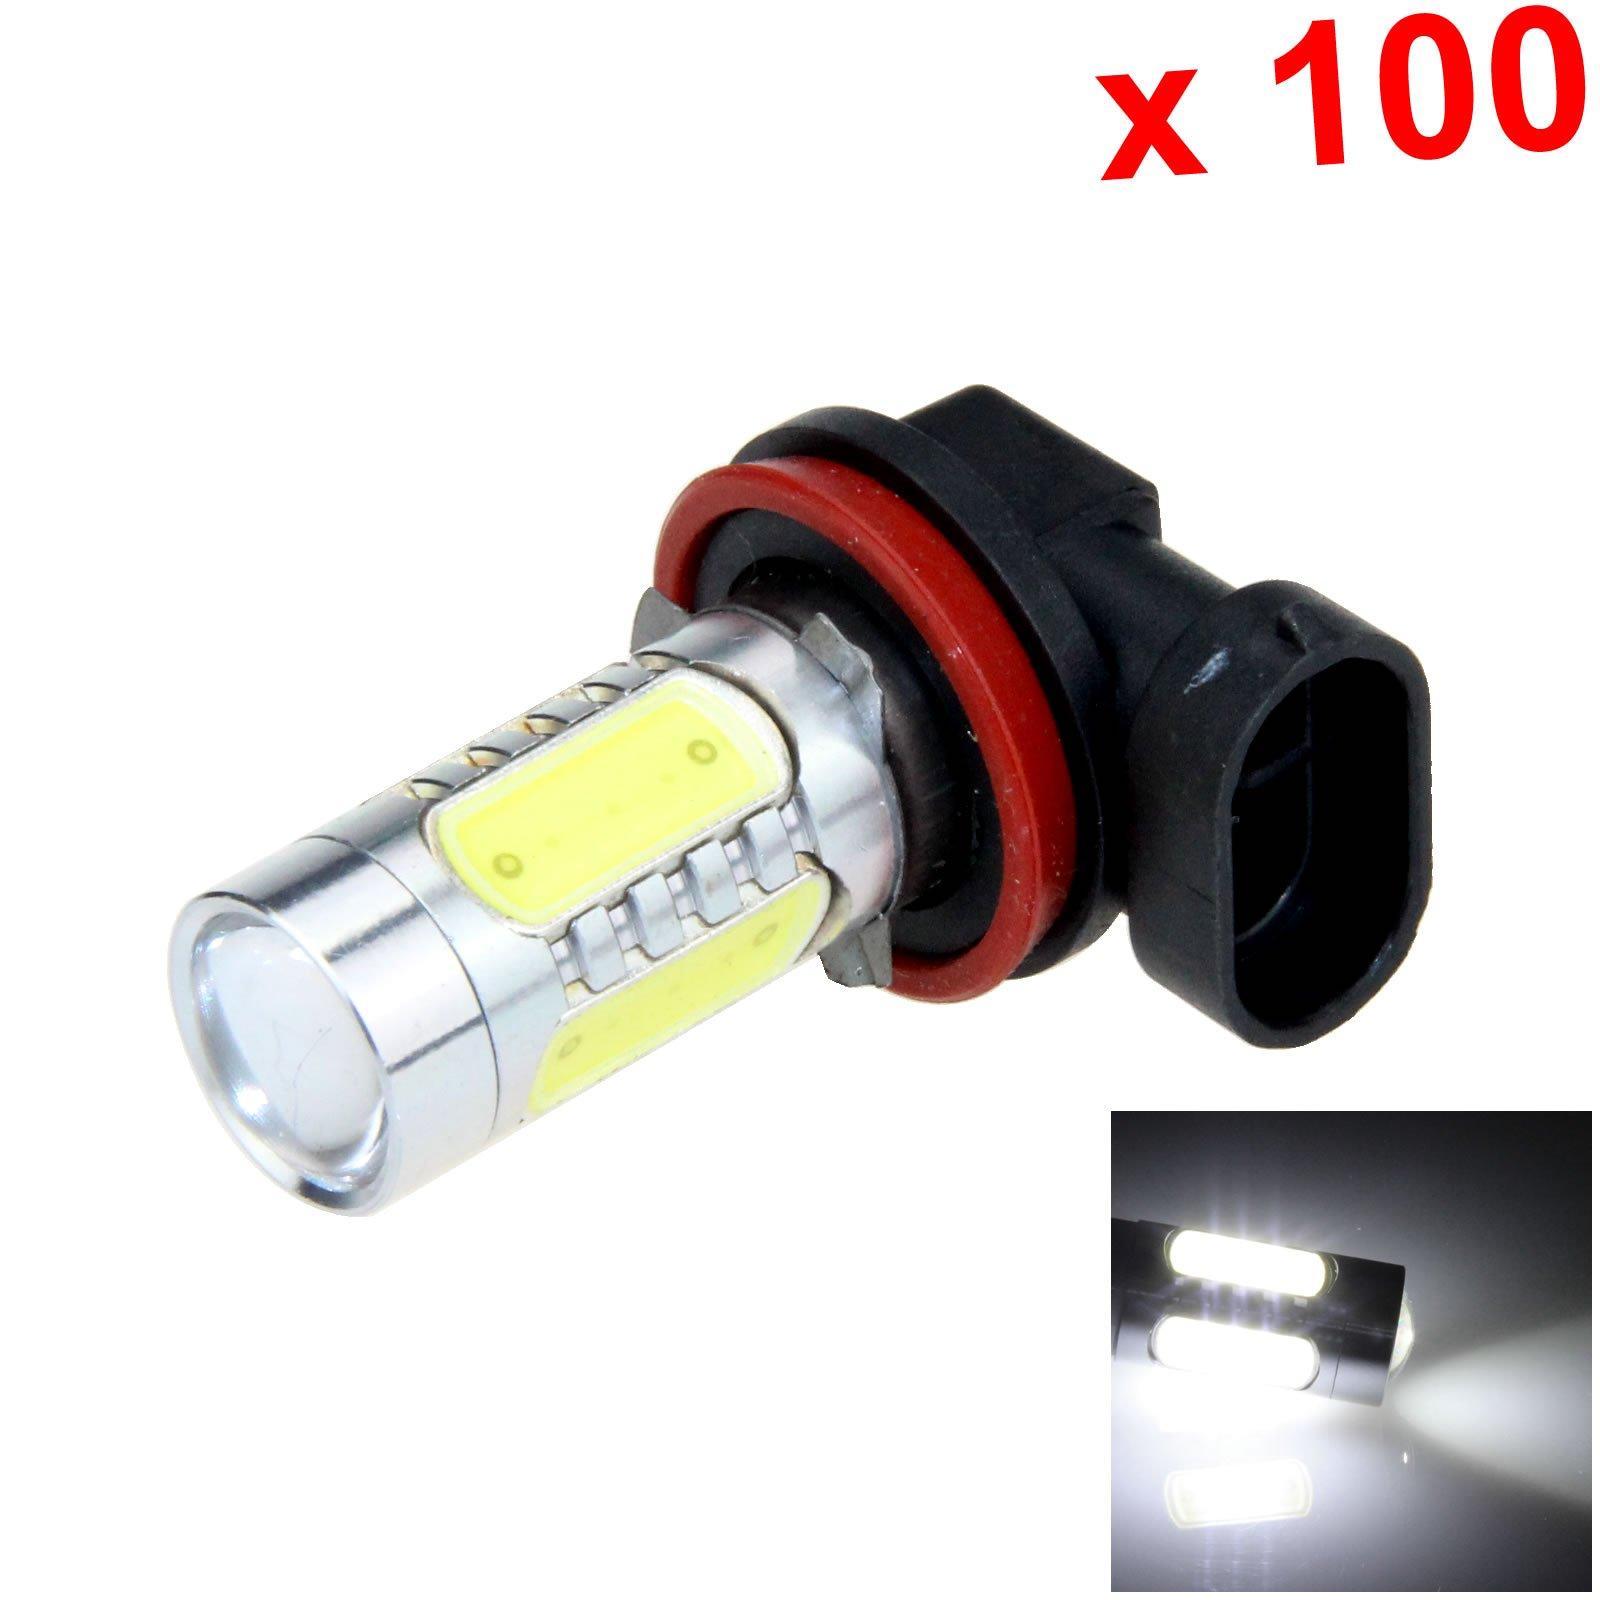 ZHANSHENZHEN White RV H11 Signal Blub Fog Lamp 4x COB SMD +1 CREE LED 5 Emitters DC 12V PGJ19-15 H211-W (Pack of 100)